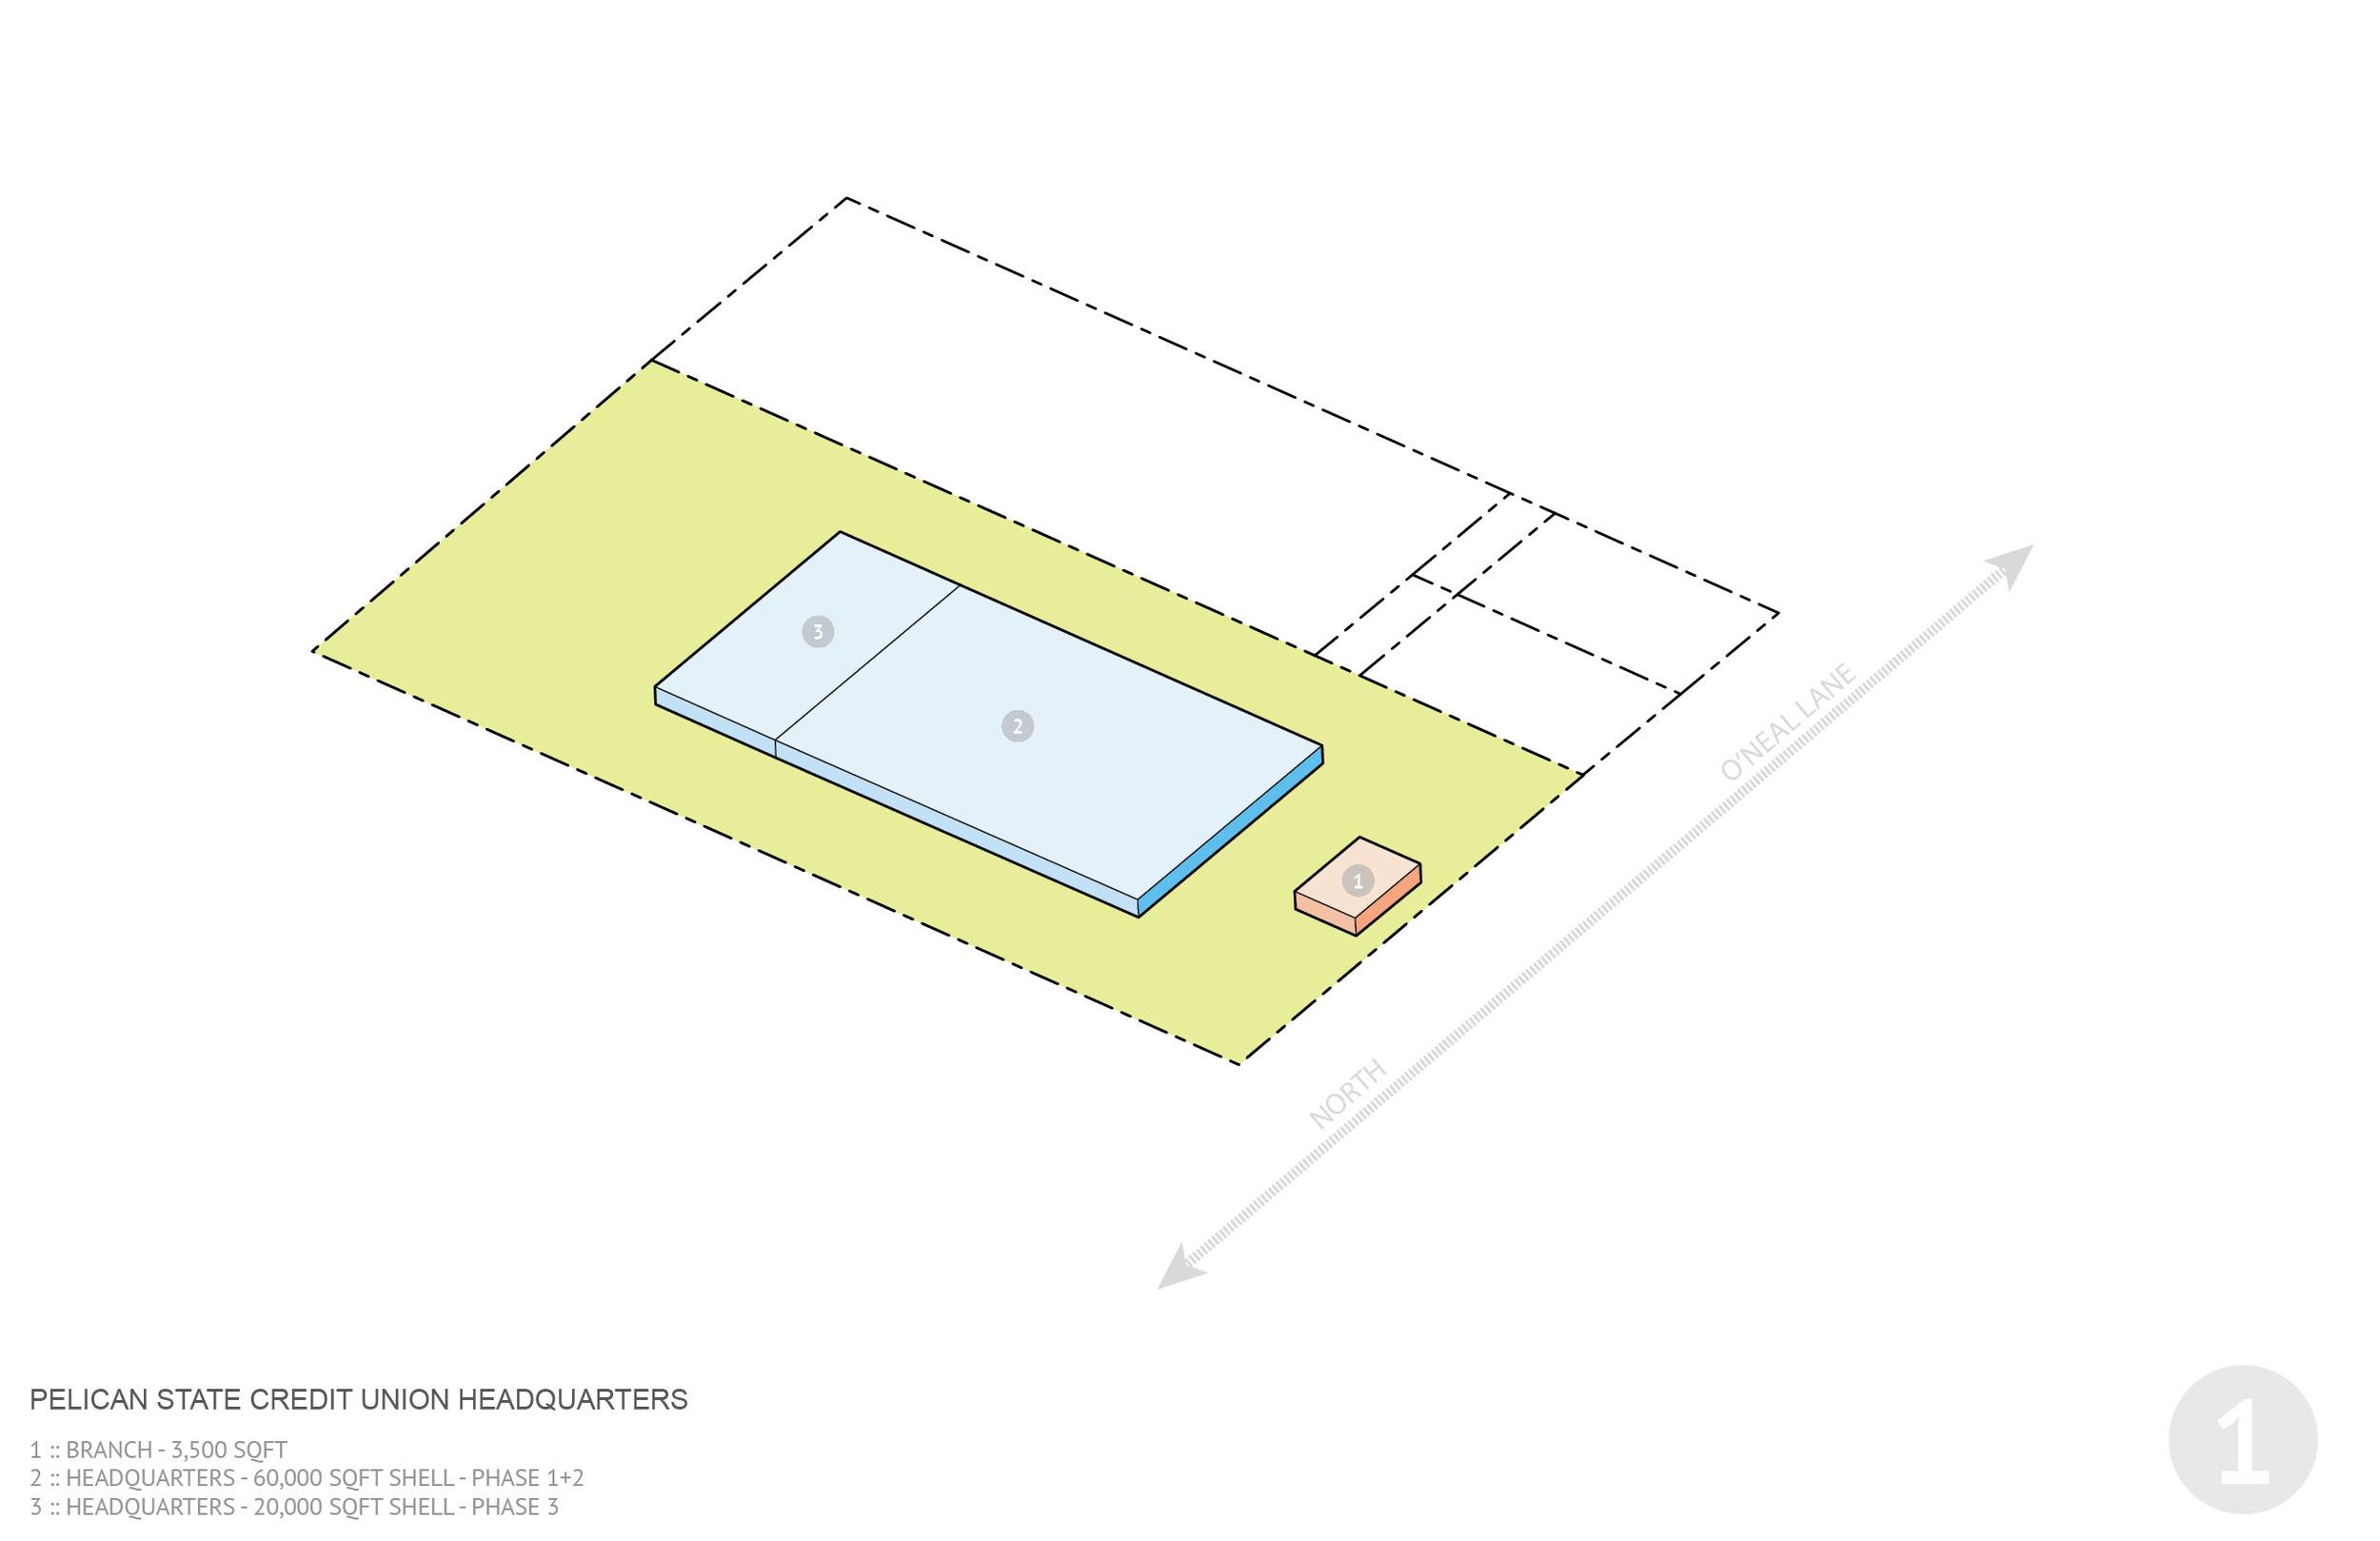 A_SlideshowDiagram_1.jpg